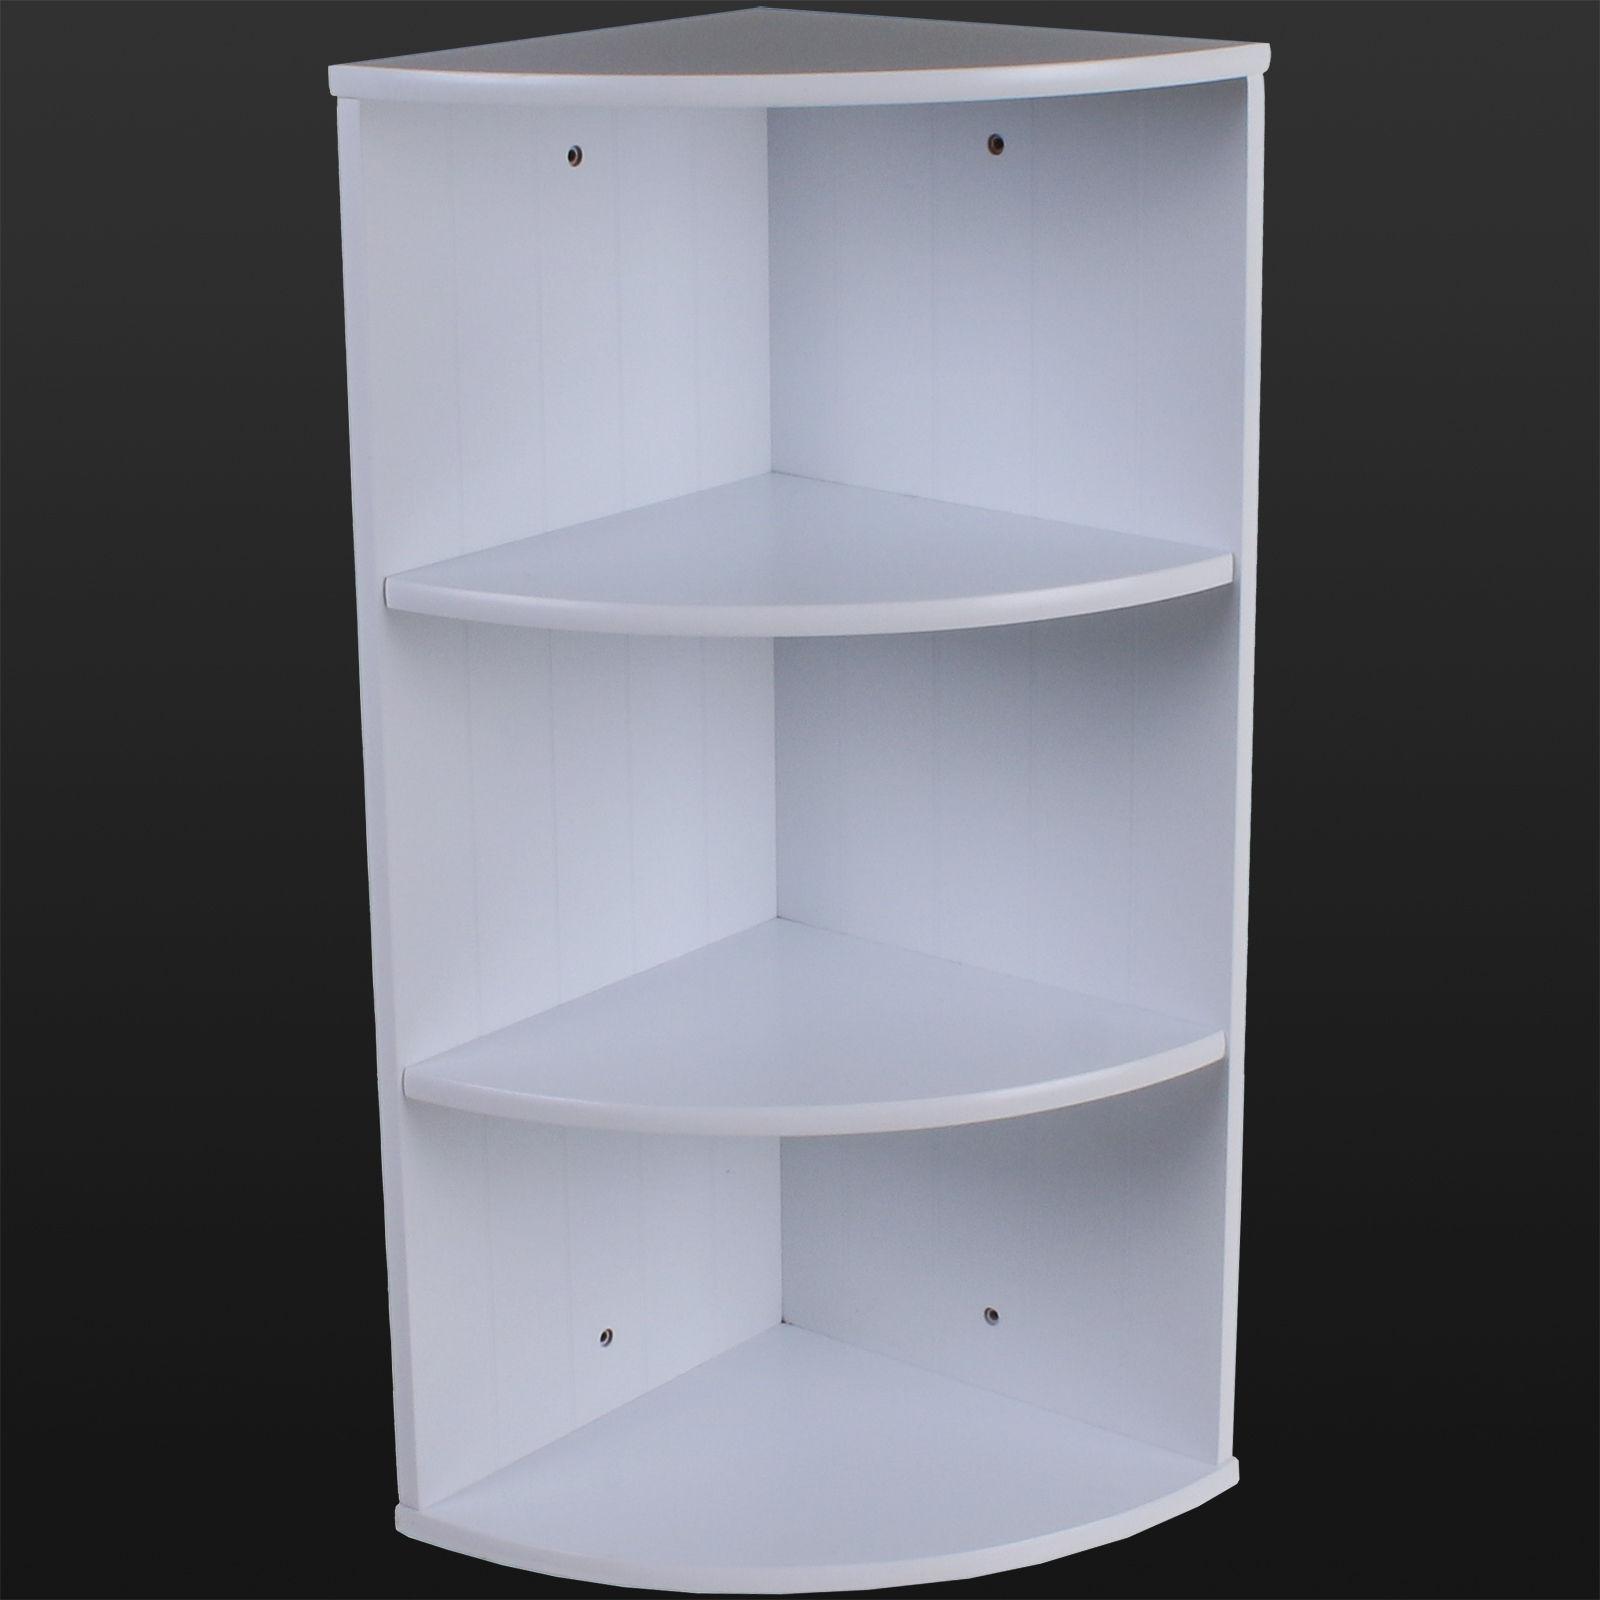 Details About Bathroom Corner Shelving Storage Unit Wooden Shelves White Wall Mountable Unit